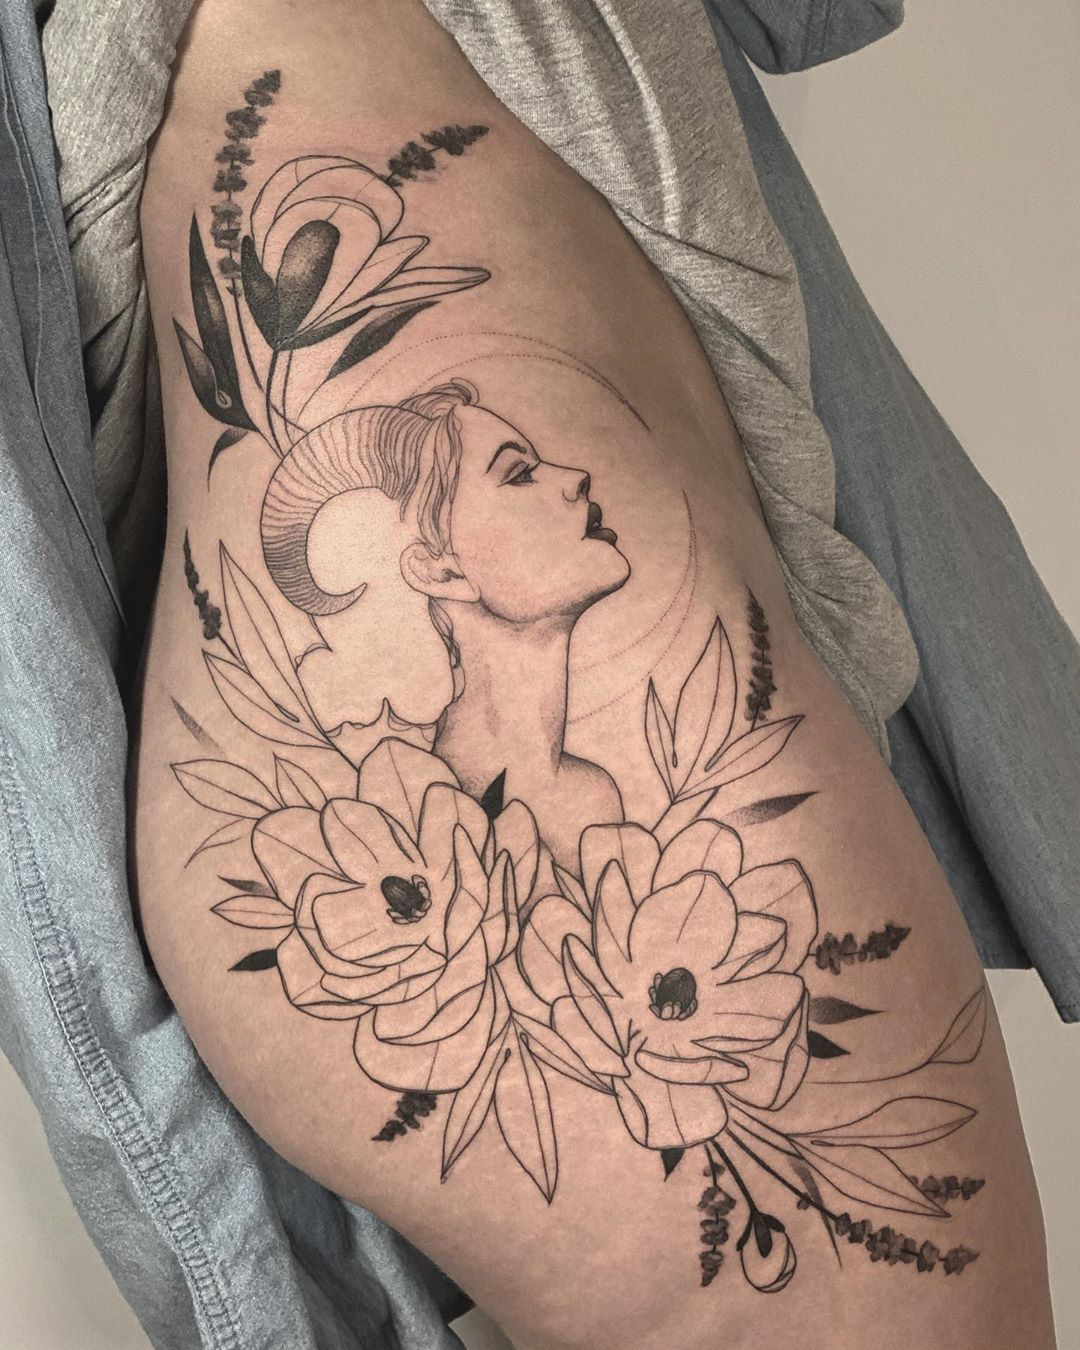 Jawn kota tattoo artist on instagram started this